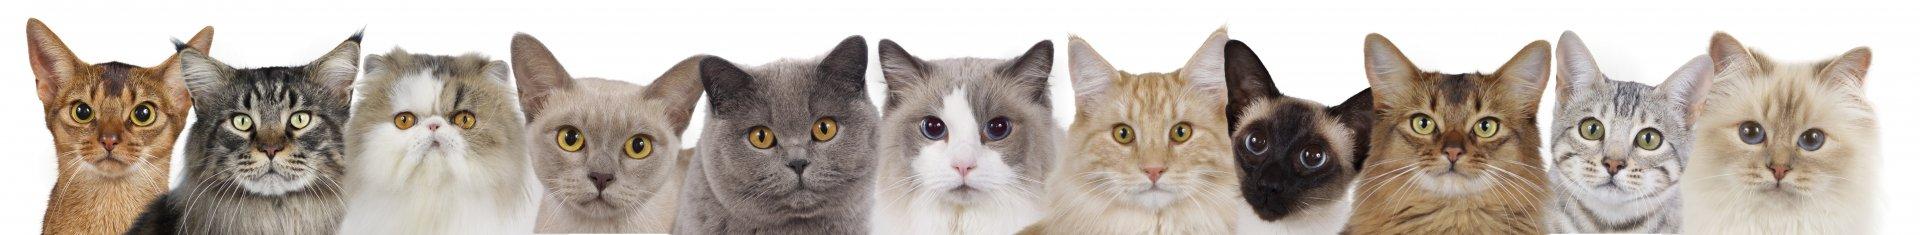 Thornleigh Cats